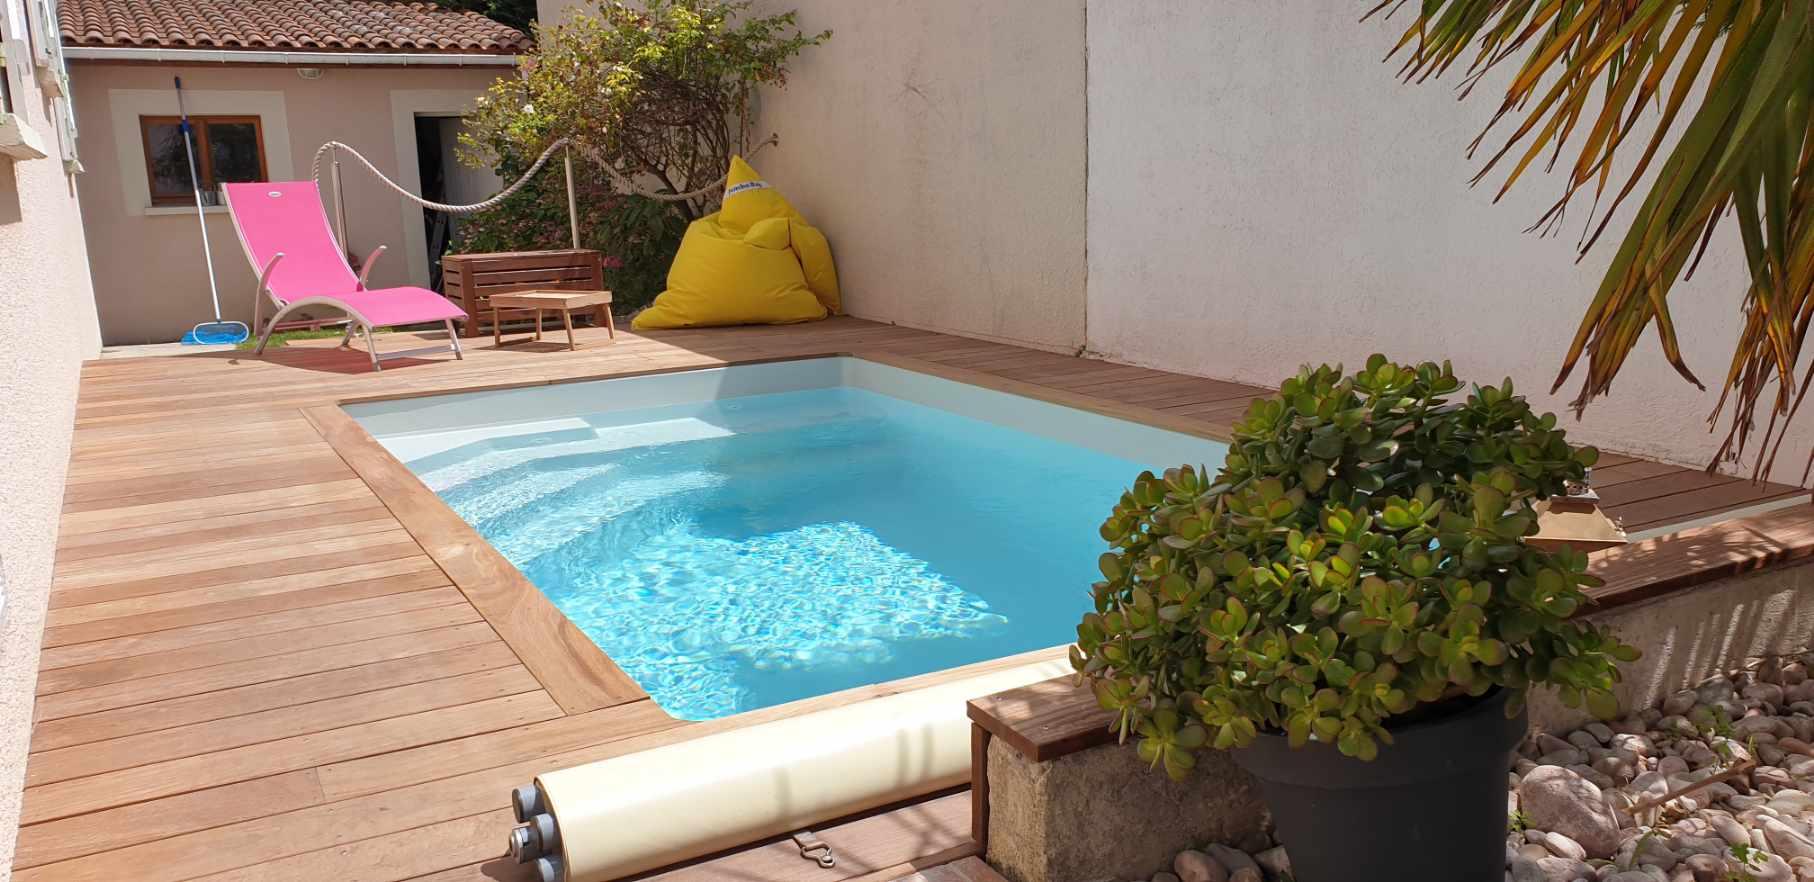 Piscines coques, Piscines coques Space Pools, Marc Robin Piscines